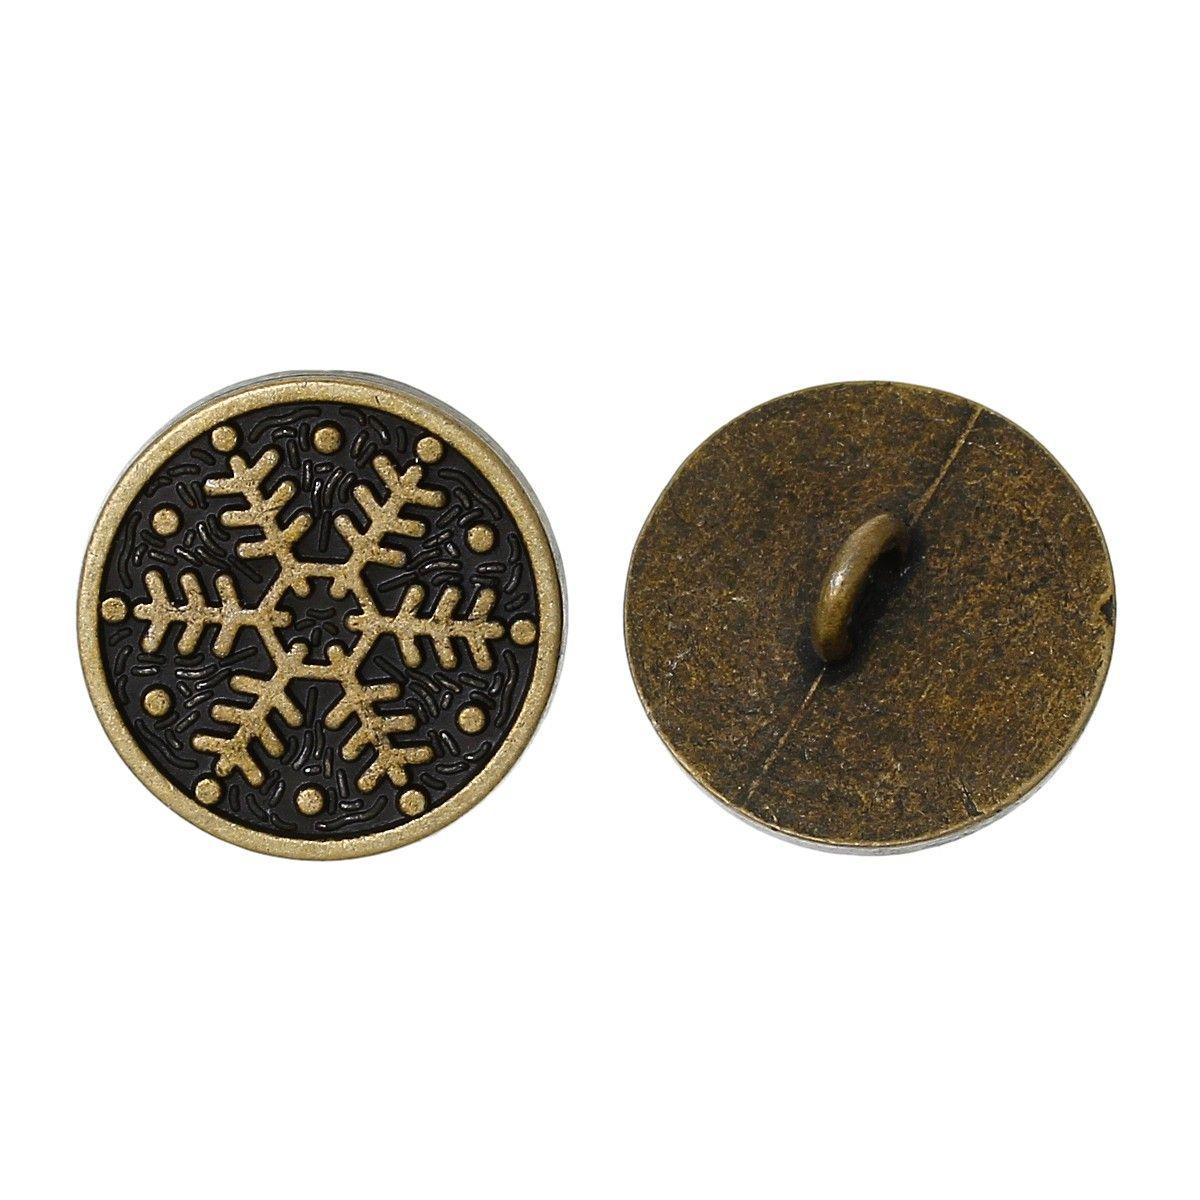 Metallknöpfe / 10 Stk. / Ø 1,8 cm